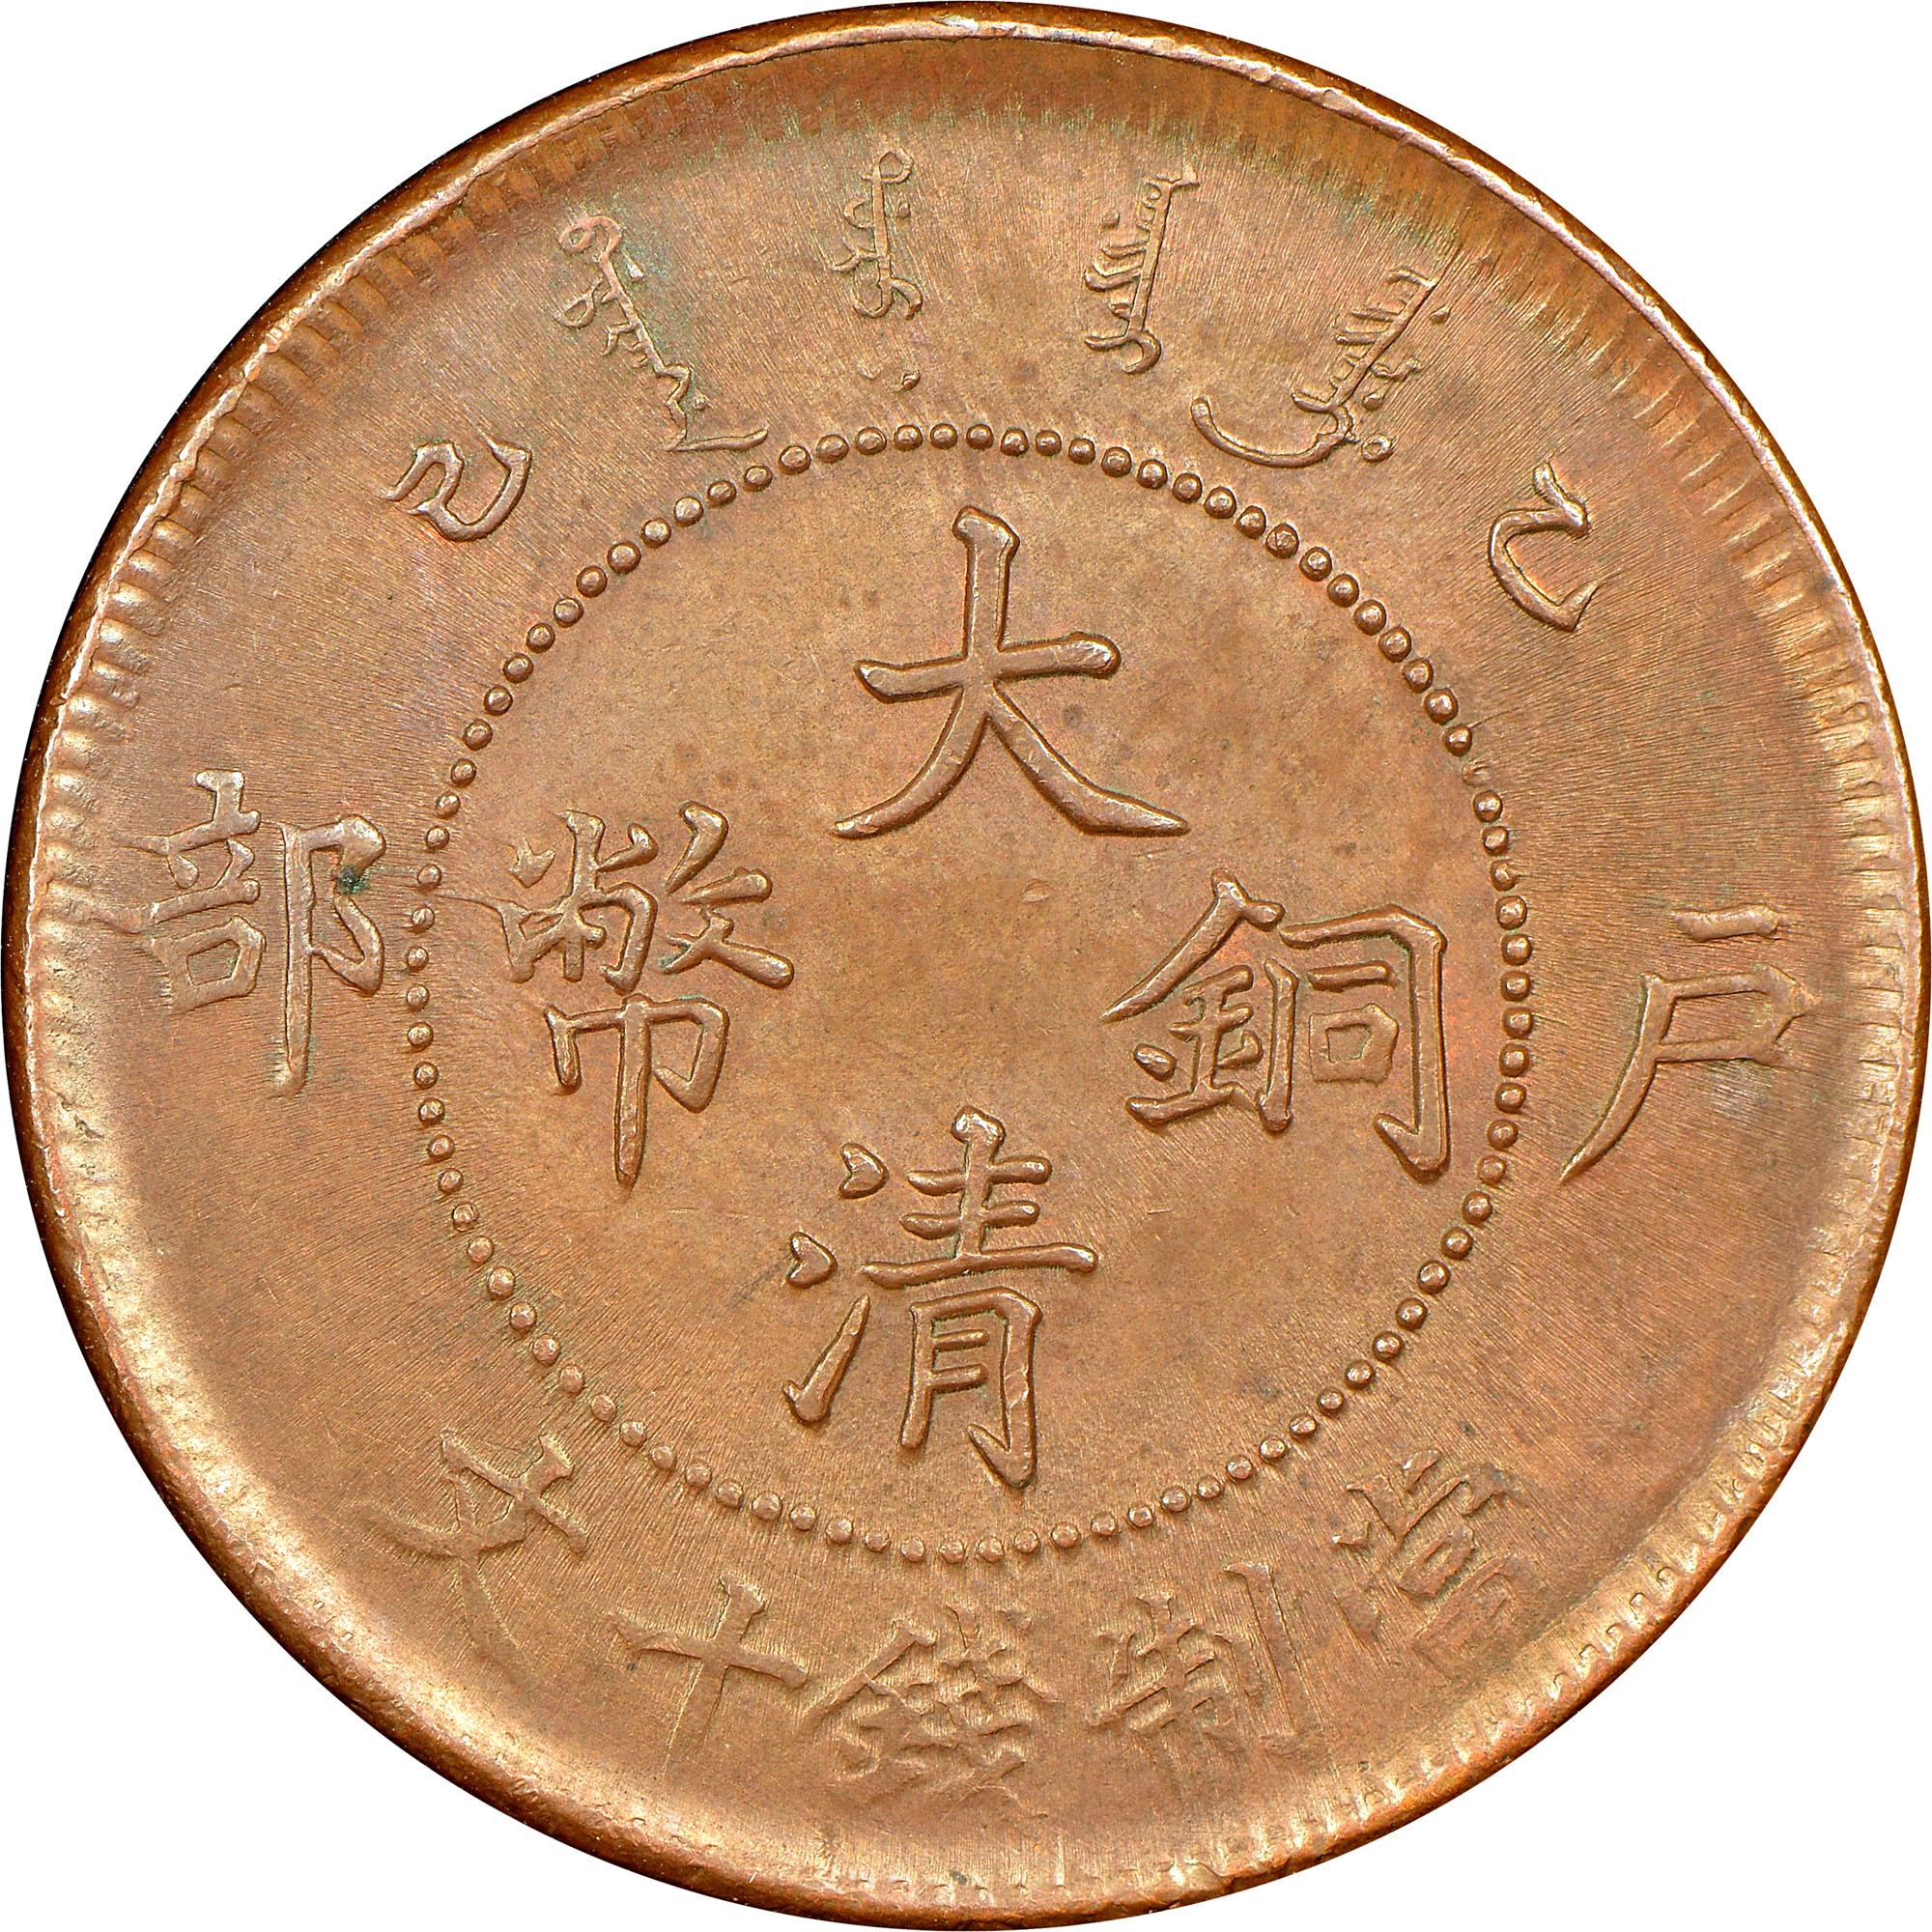 1905 China EMPIRE 10 Cash obverse